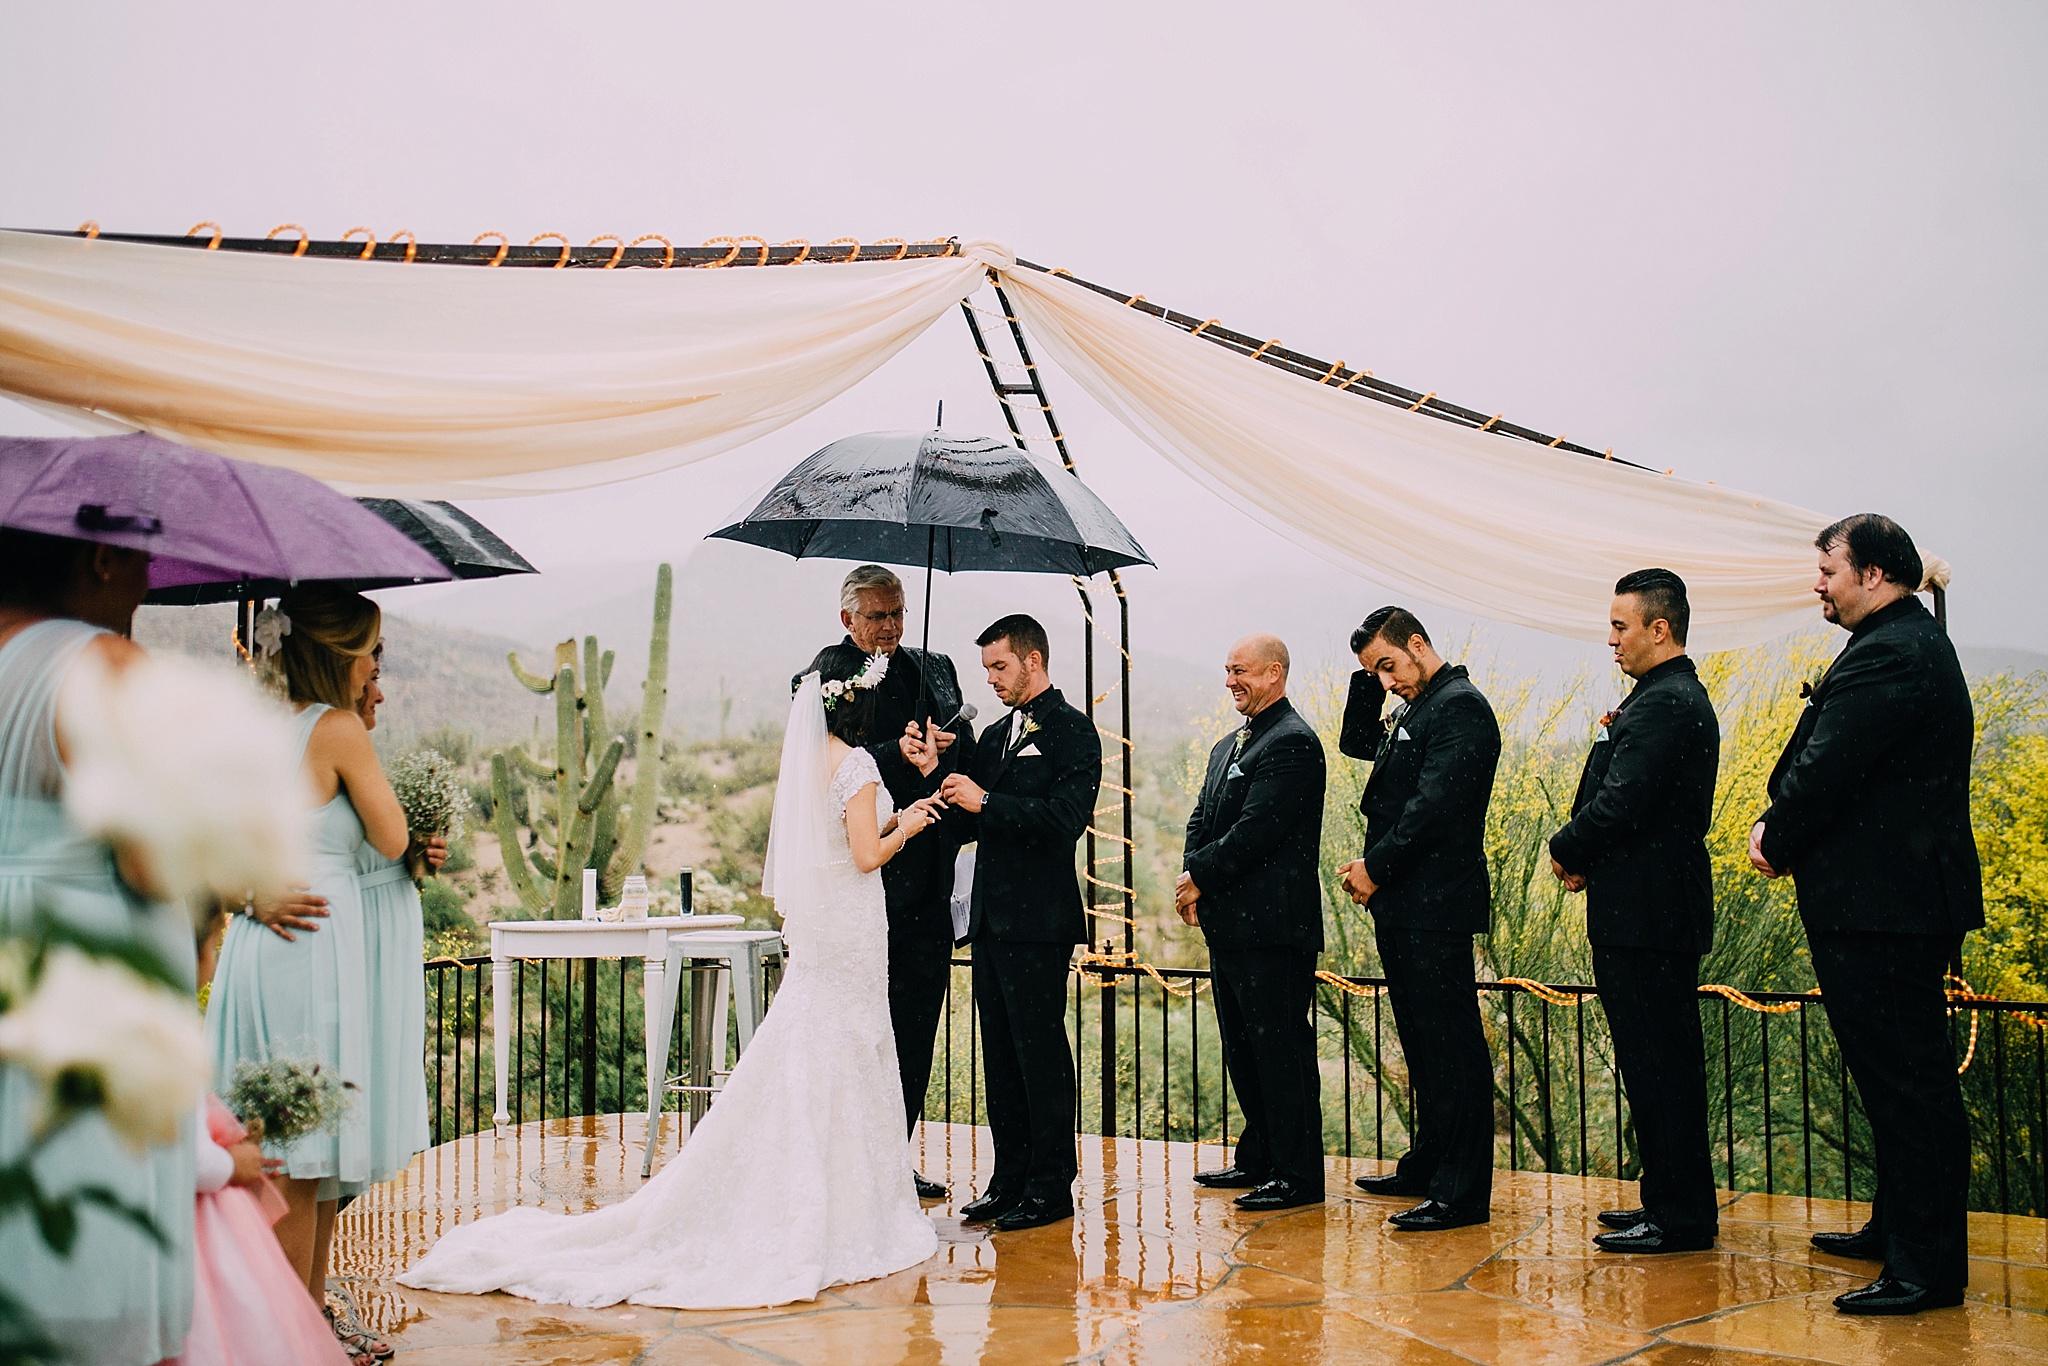 saguaro buttes tucson arizona wedding